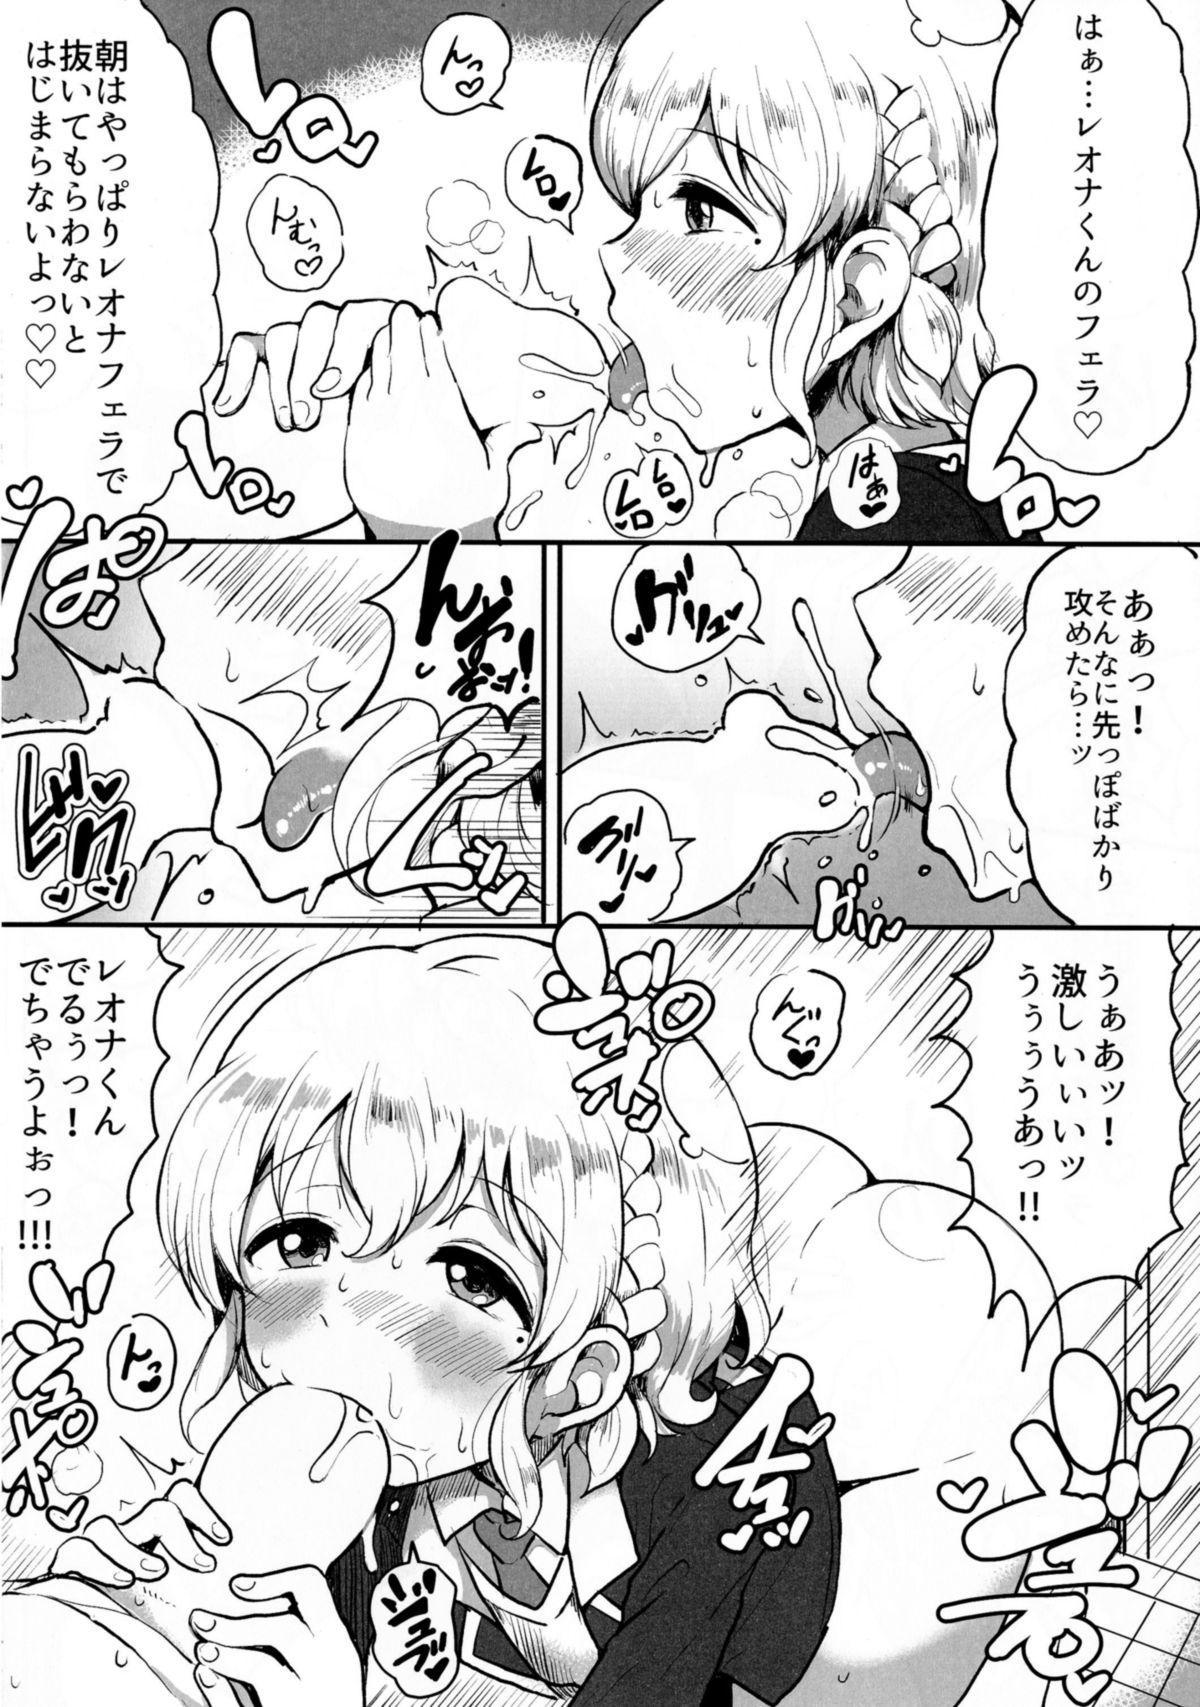 Suki suki daisuki Reona-kun2 4